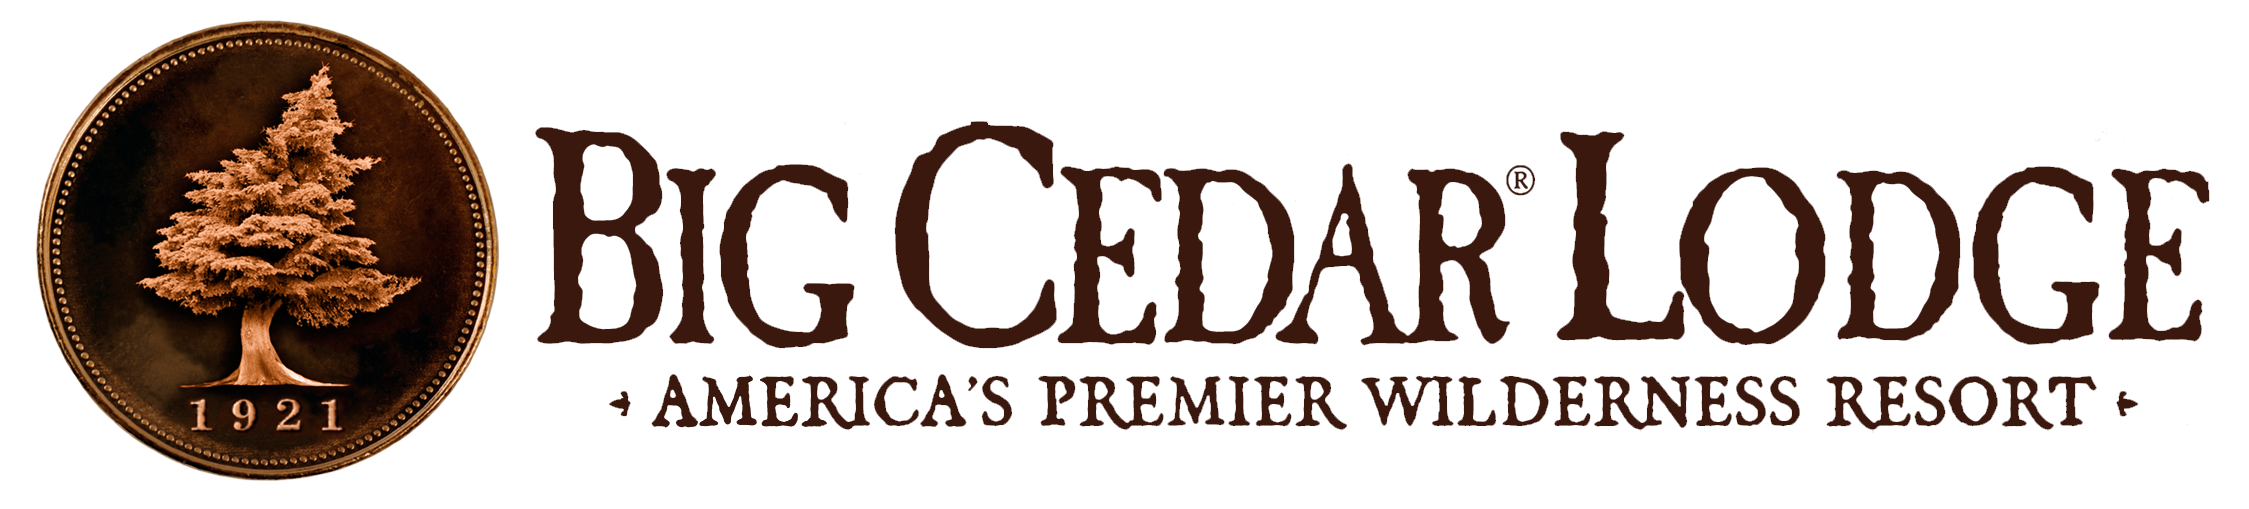 Big Cedar Lodge - Houston Honeymoon, Travel, Honeymoon, Travel